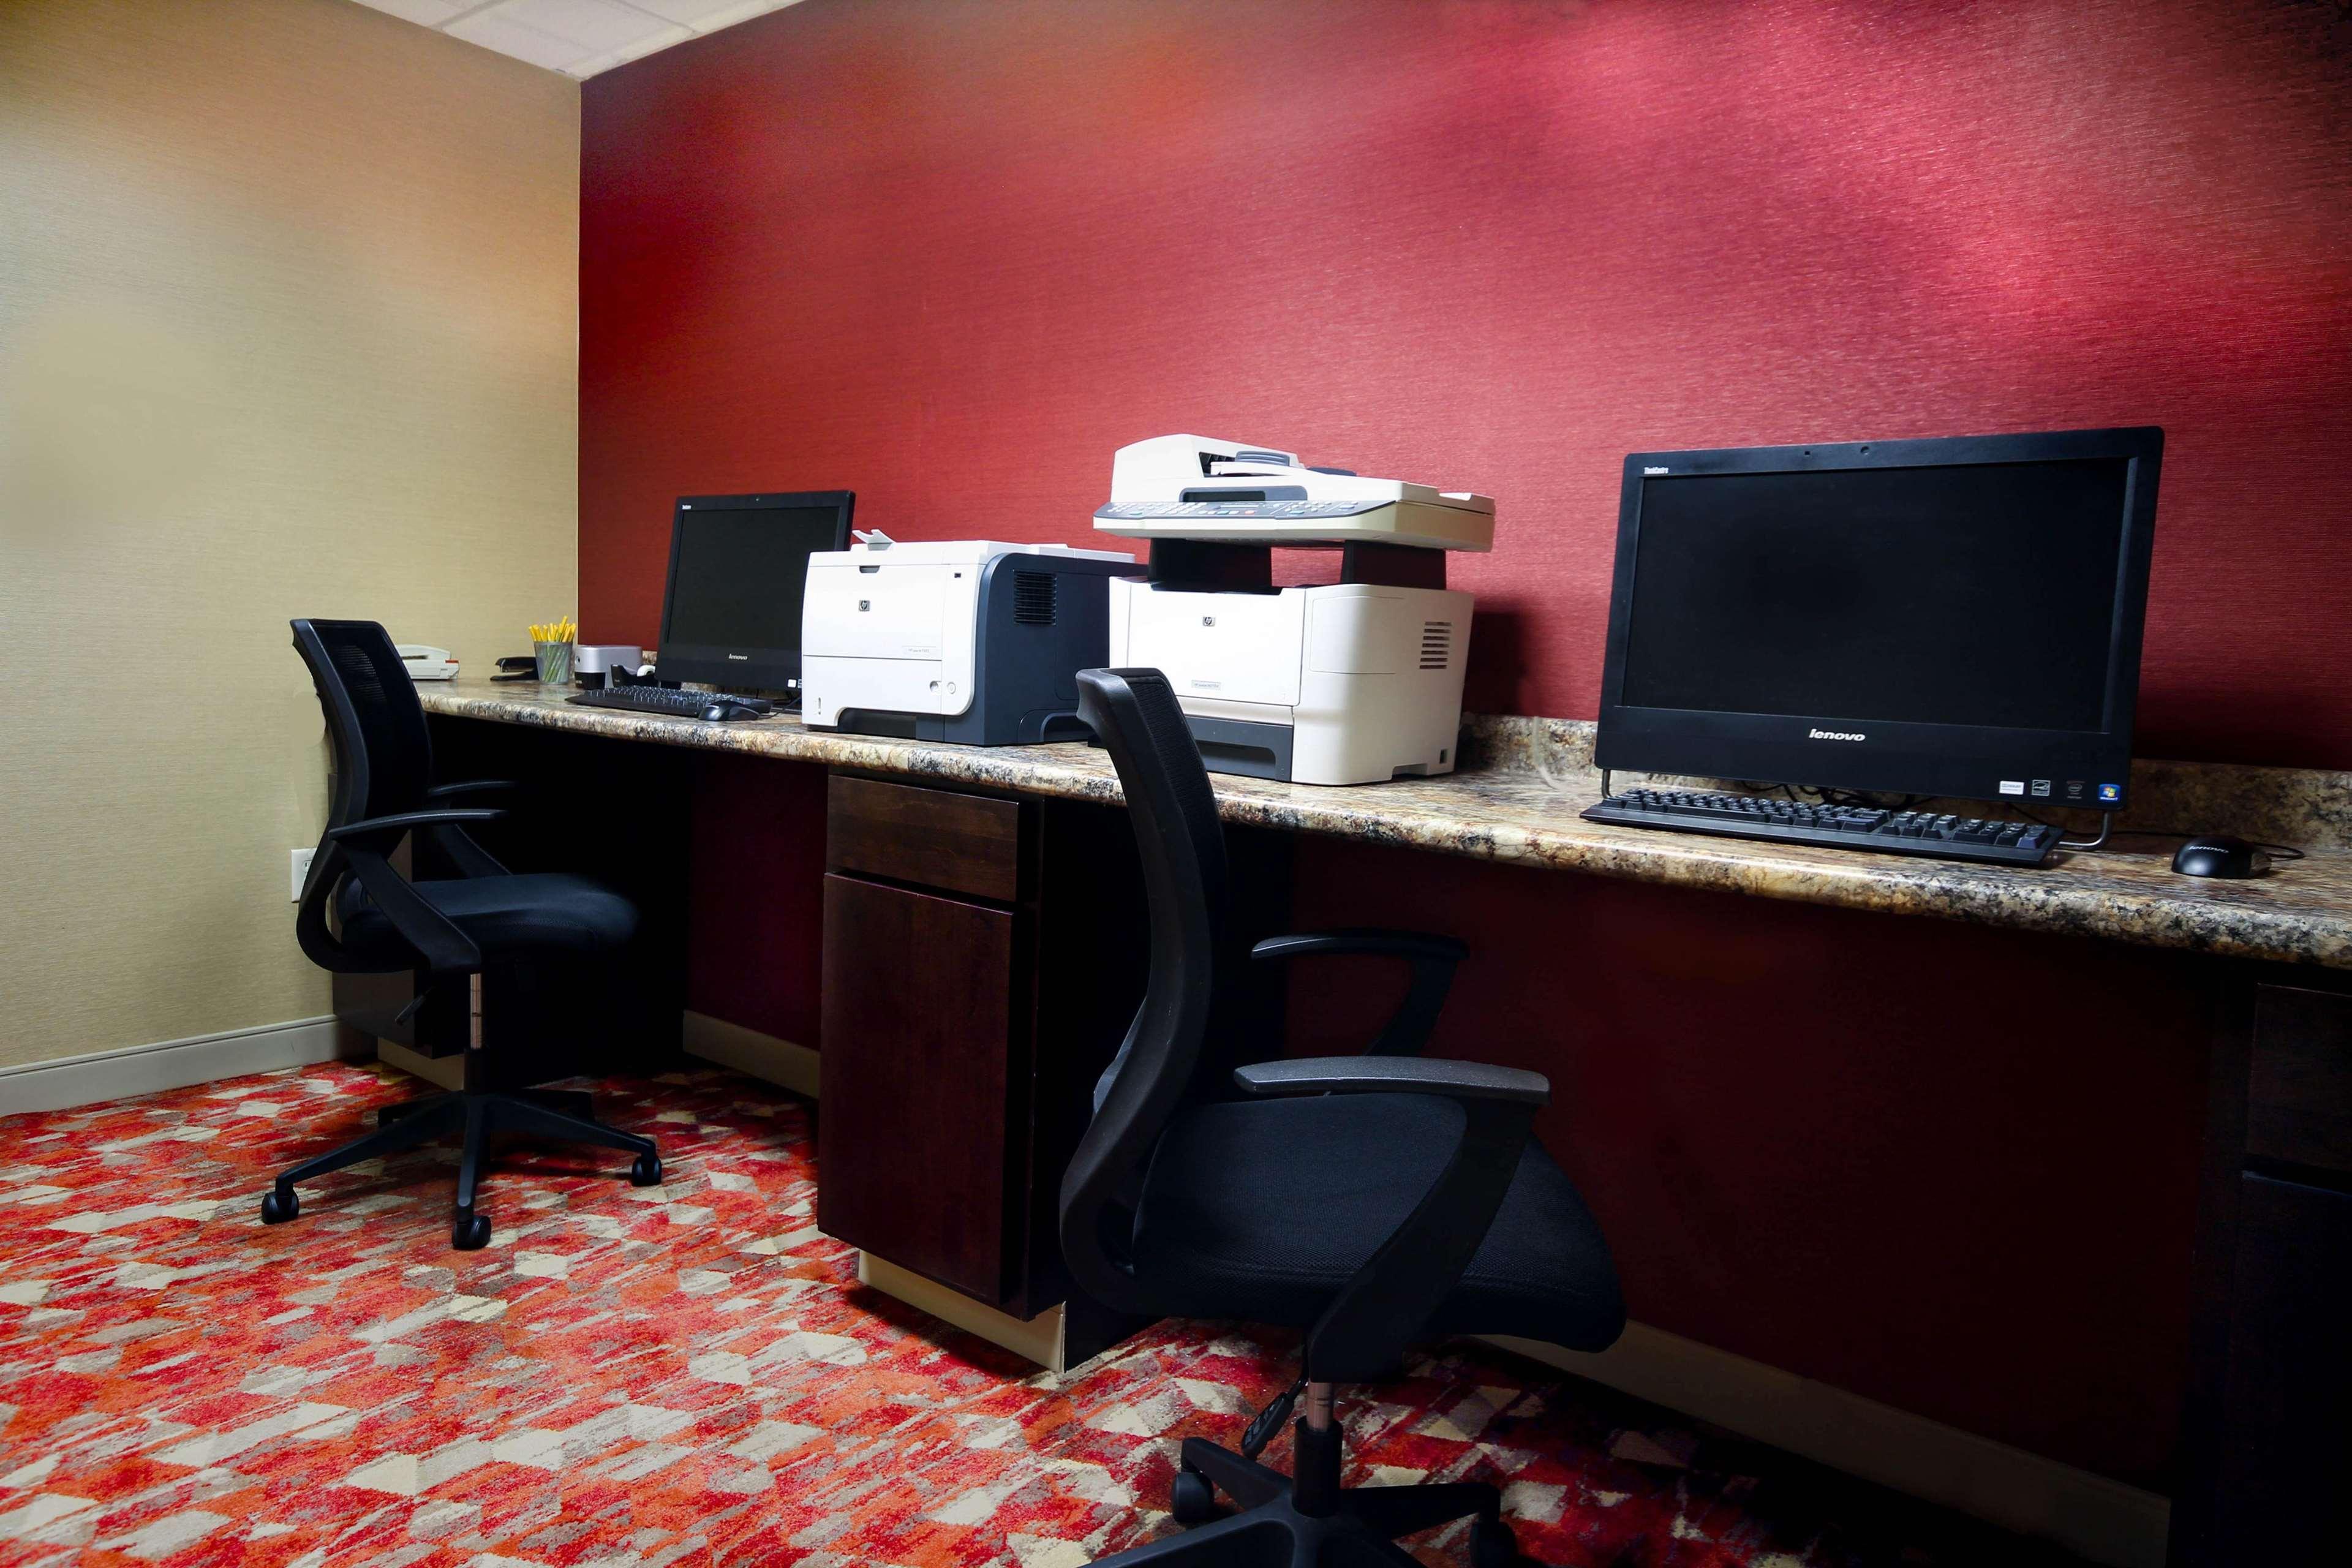 Hilton Garden Inn Elkhart 3401 Plaza Court Elkhart, IN Hotels U0026 Motels    MapQuest